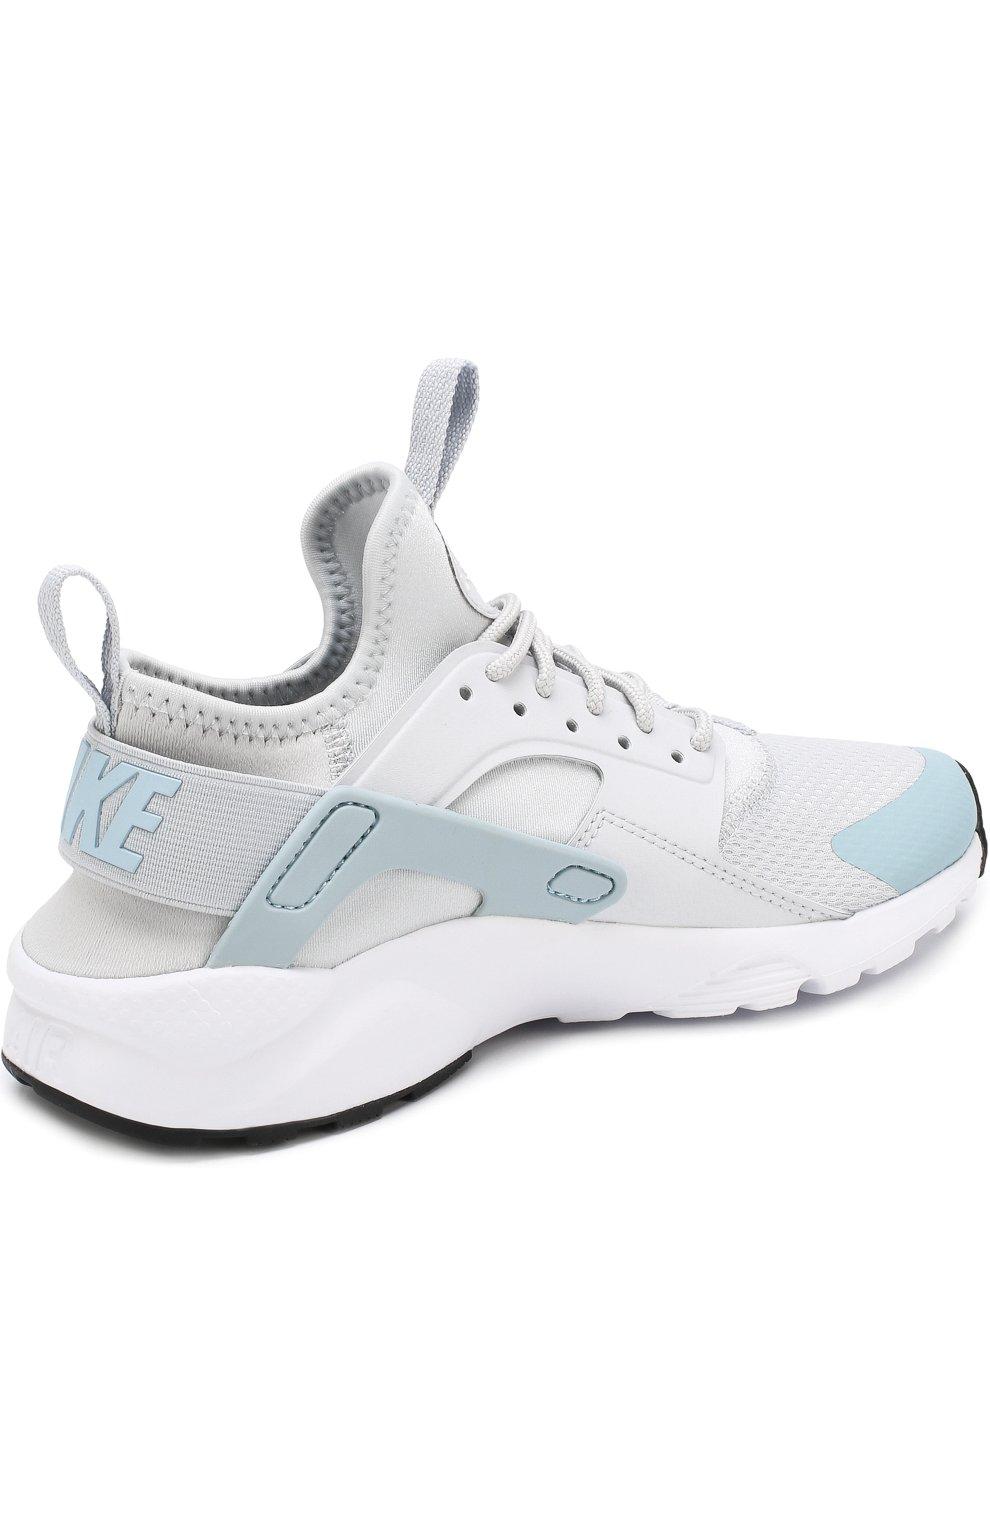 dae49850 Детские текстильные кроссовки nike air huarache ultra Nike светло-серого  цвета   Фото №3